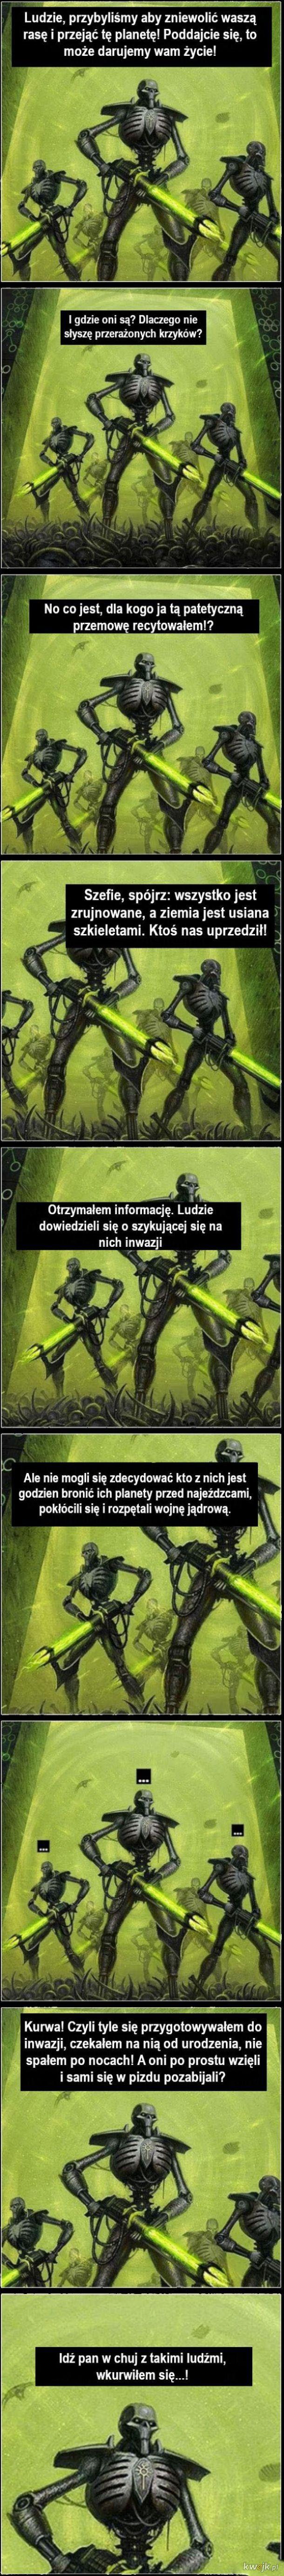 Inwazja